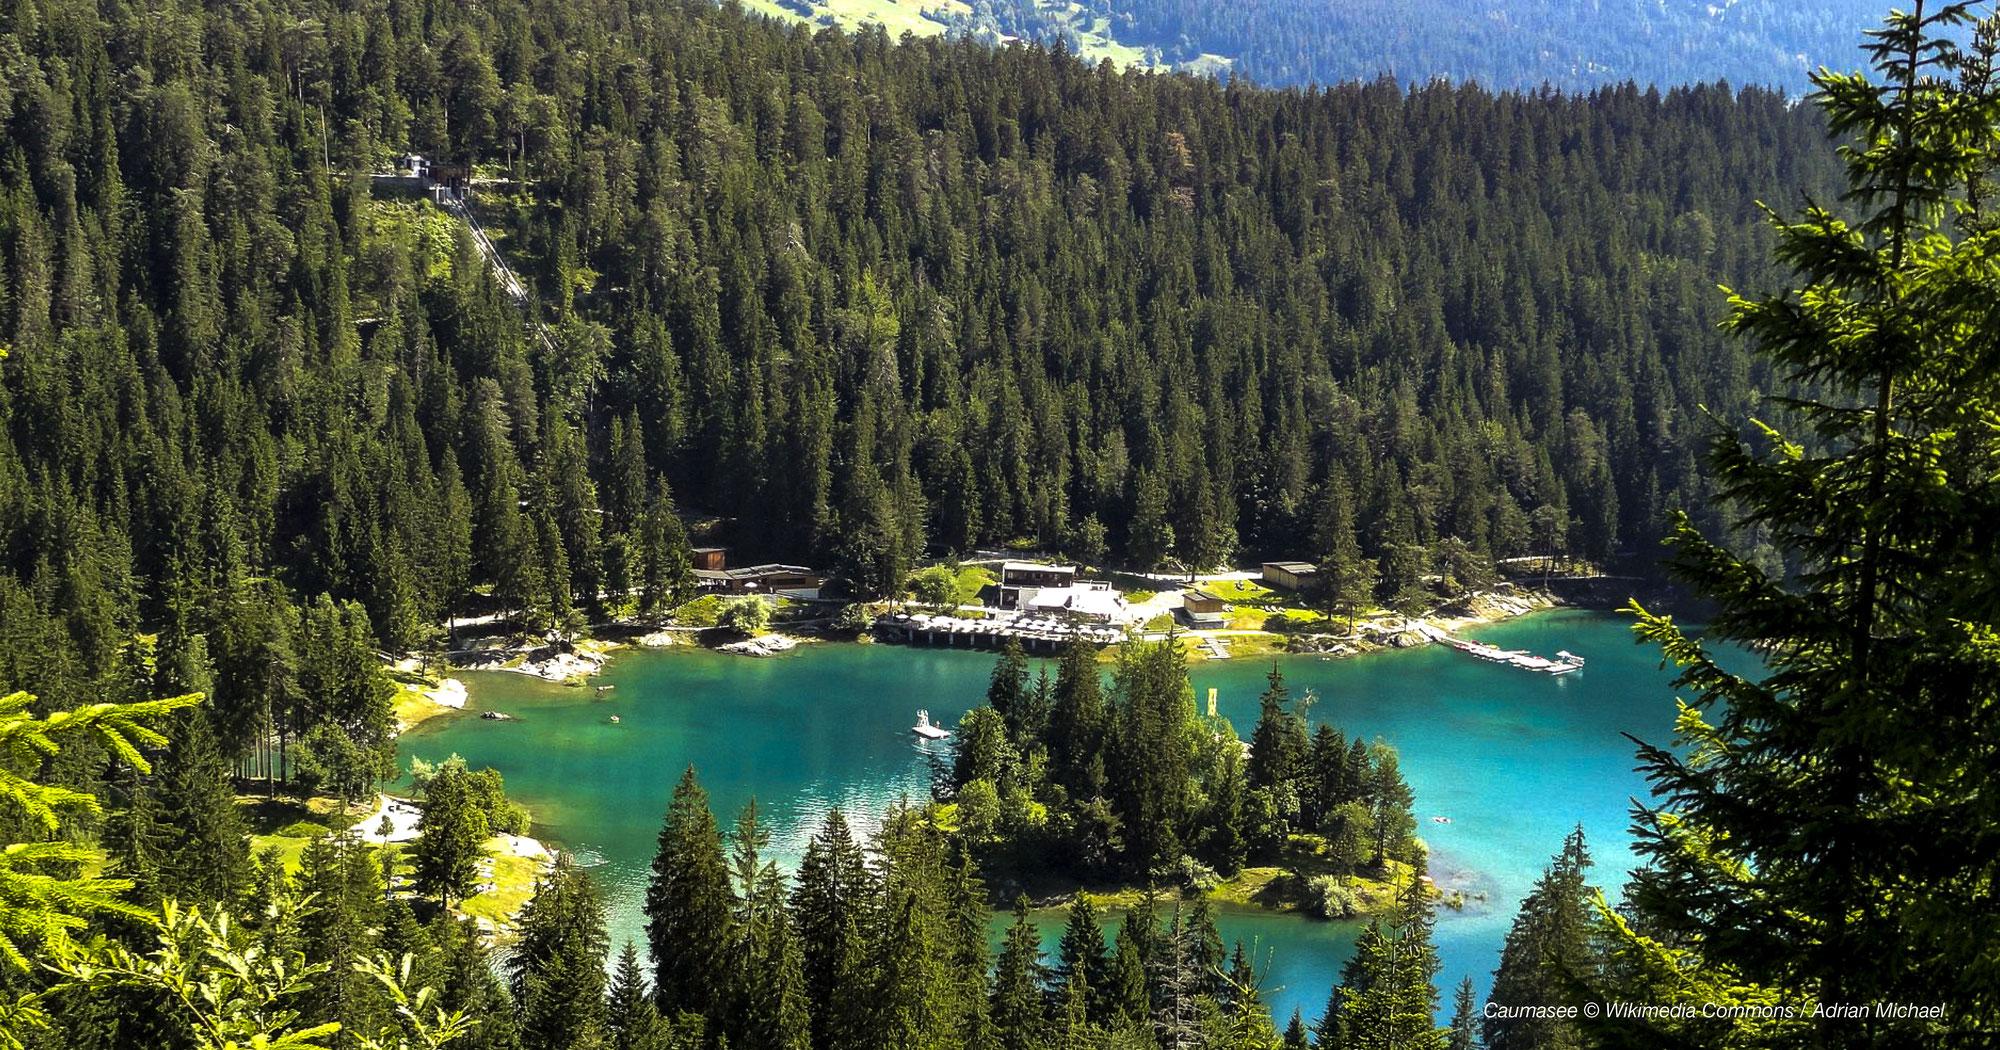 Caumasee - Traumhaft gelegener Badesee bei Flims